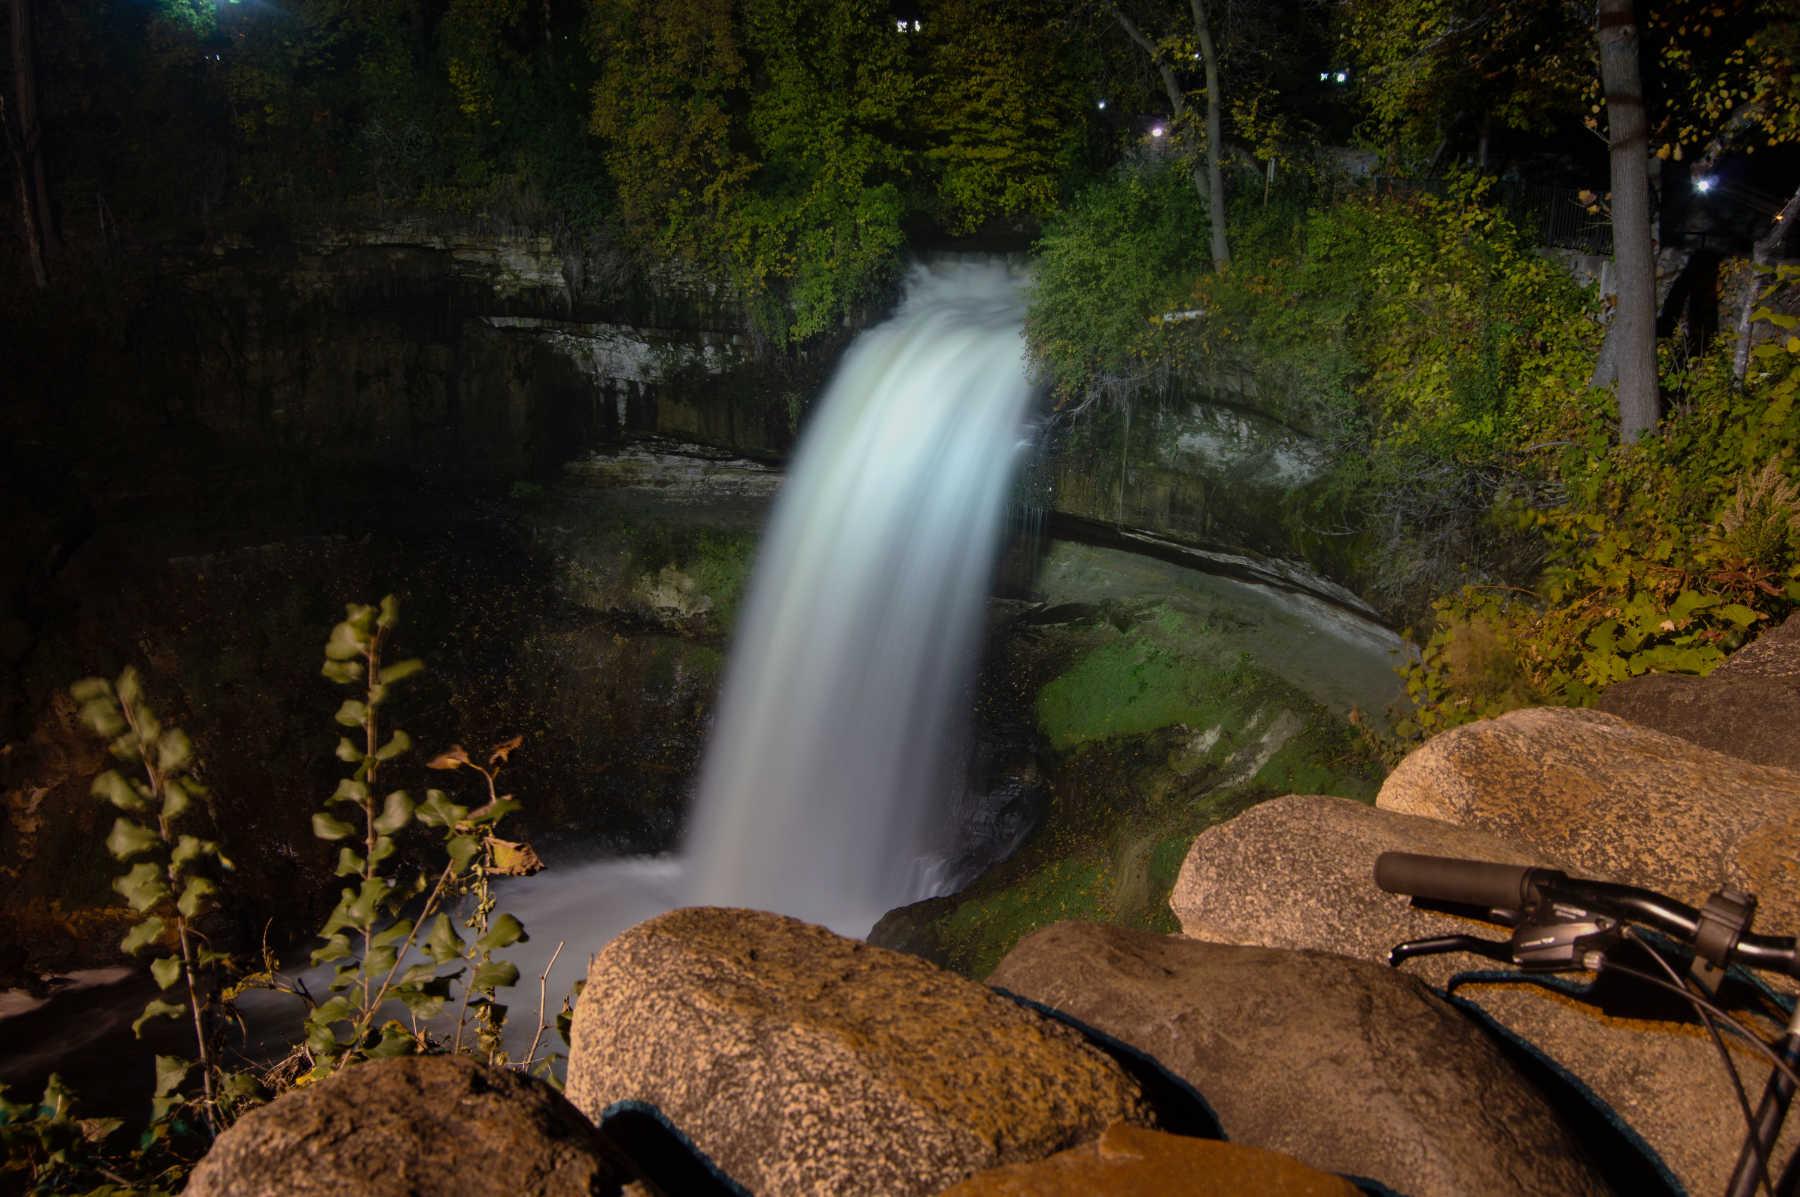 waterfall lit at night